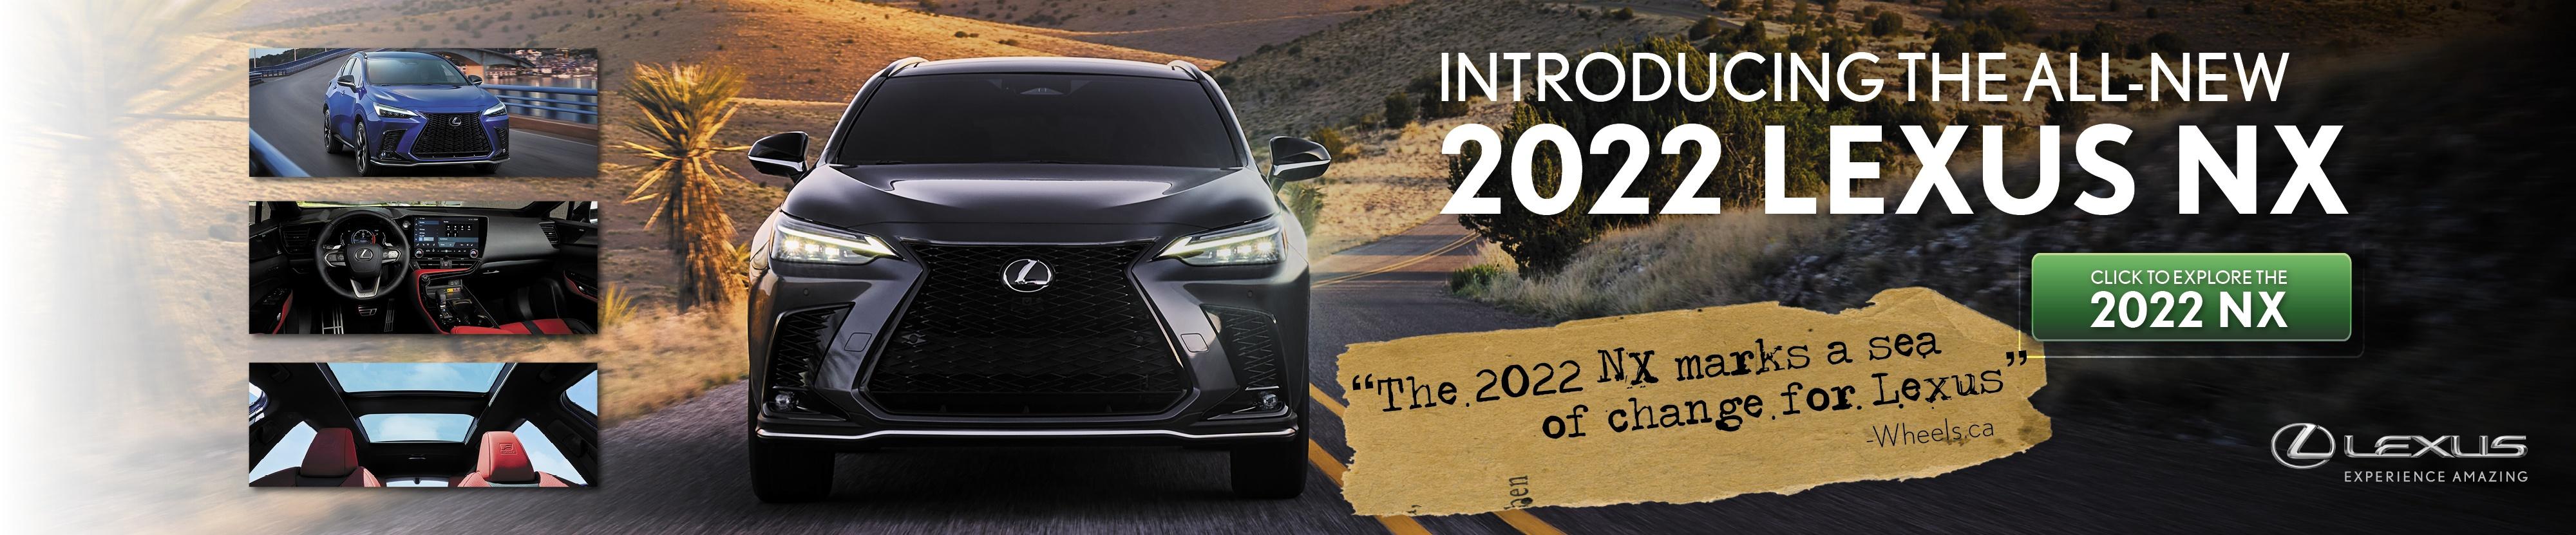 new 2022 lexus nx in toronto ontario dealership